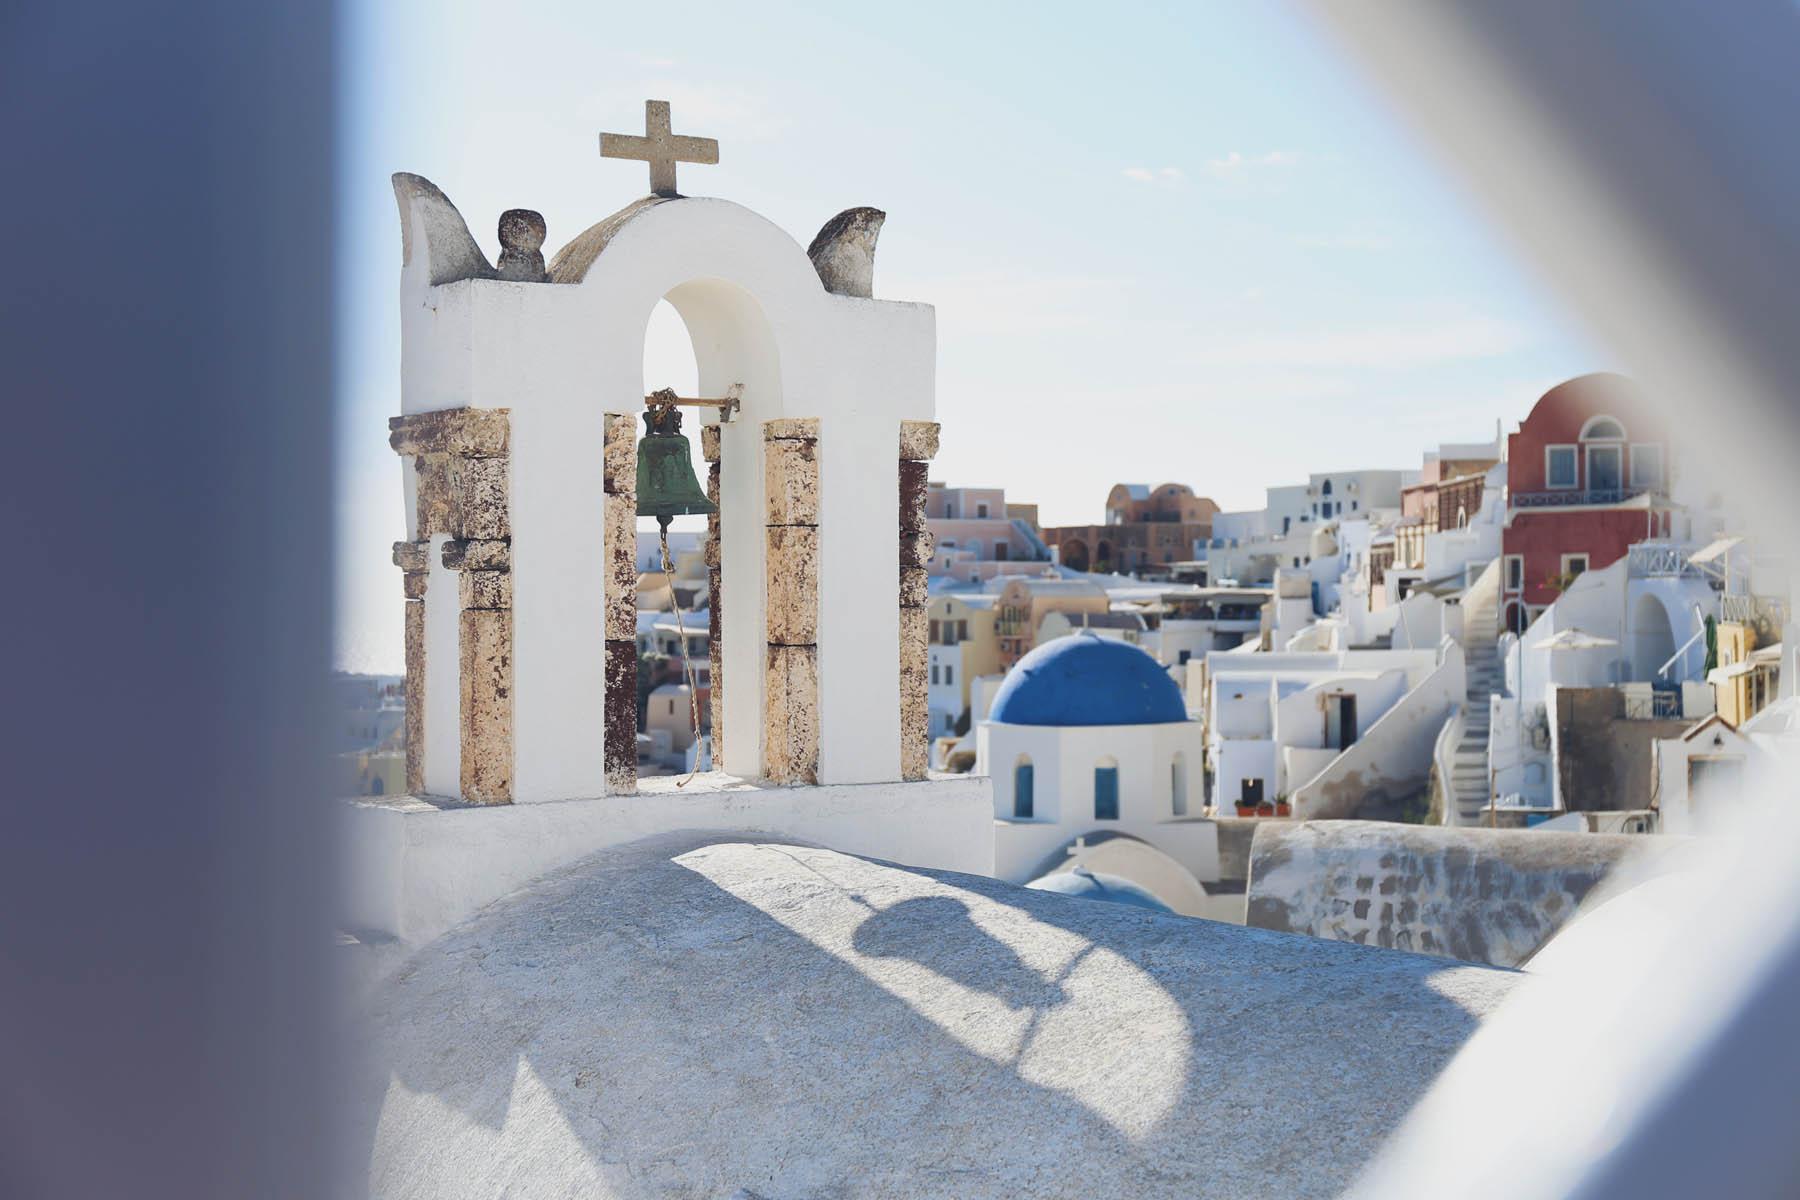 Las casitas blancas de Oia, en Santorini